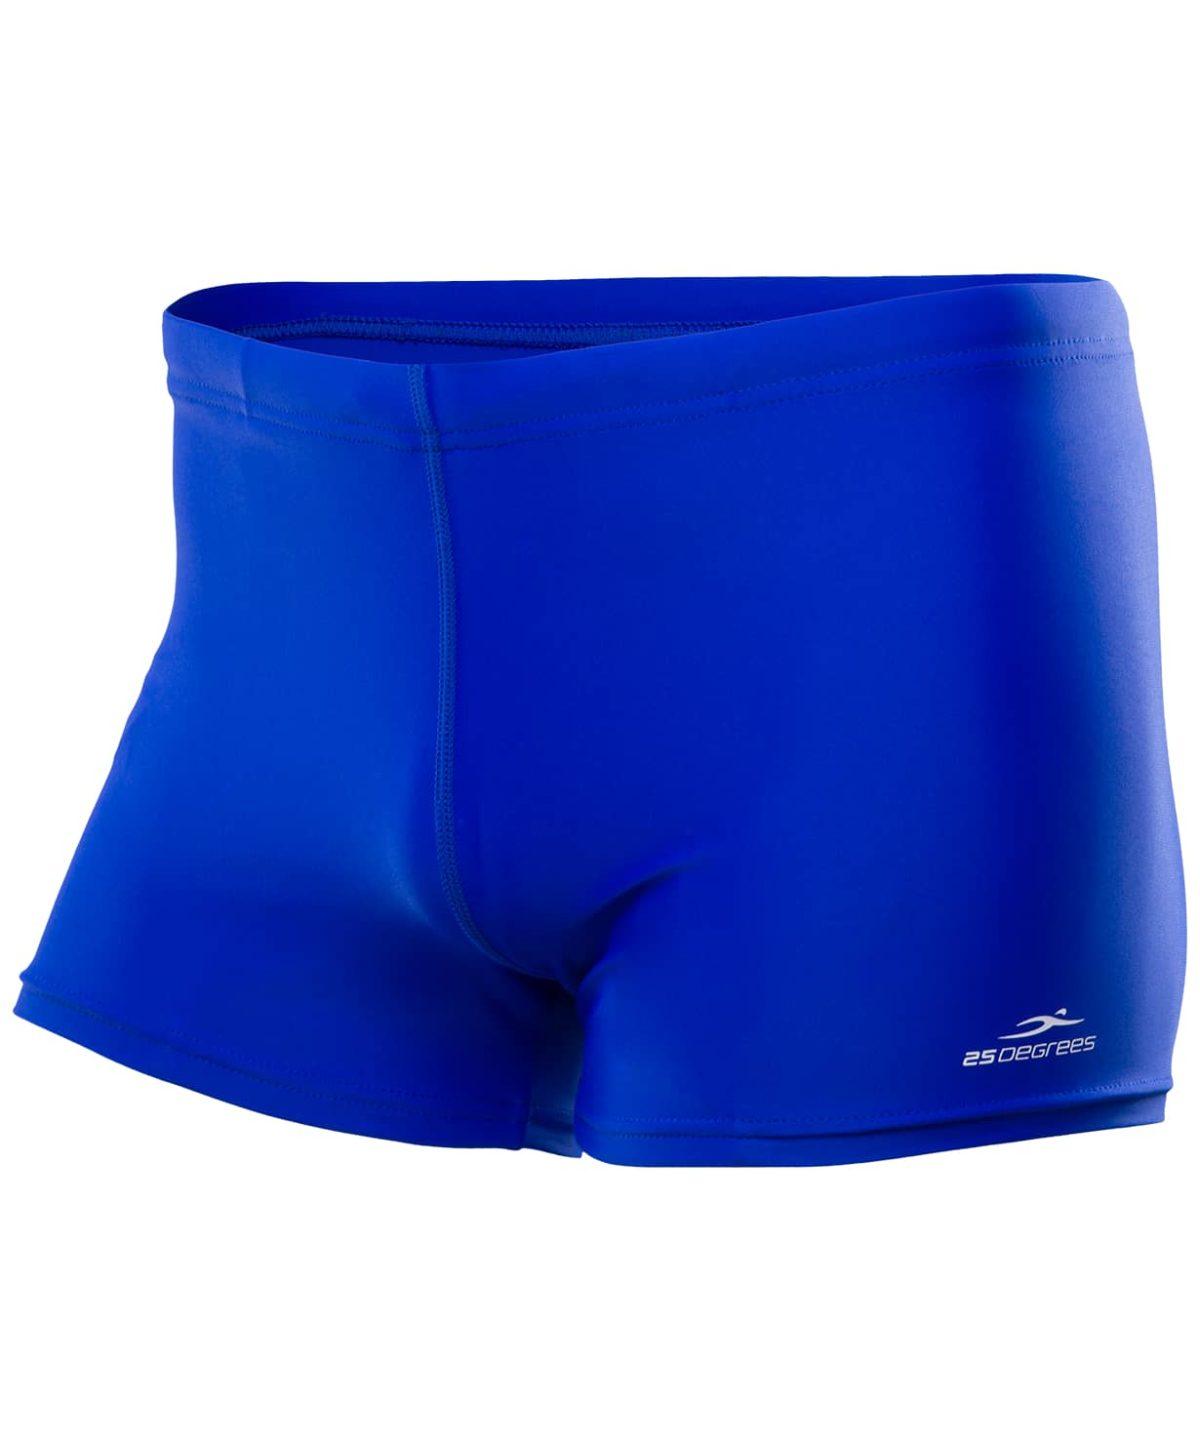 25DEGREES Hammer Blue Шорты для плавания детские, полиамид  17561 - 1